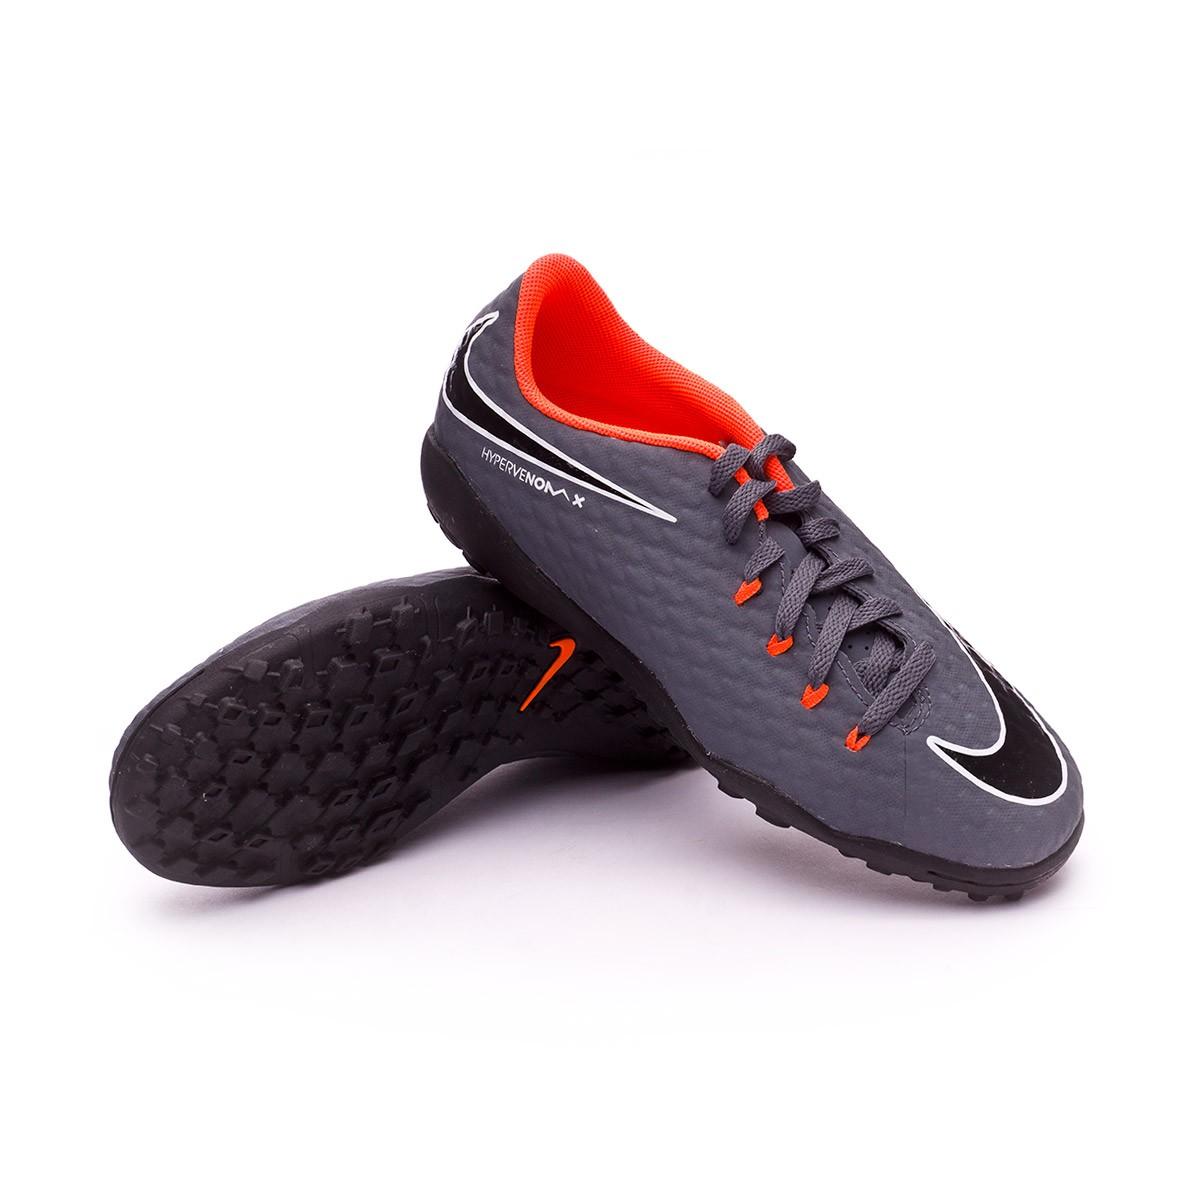 5178434b7 Football Boot Nike Kds Hypervenom PhantomX III Academy Turf Dark ...